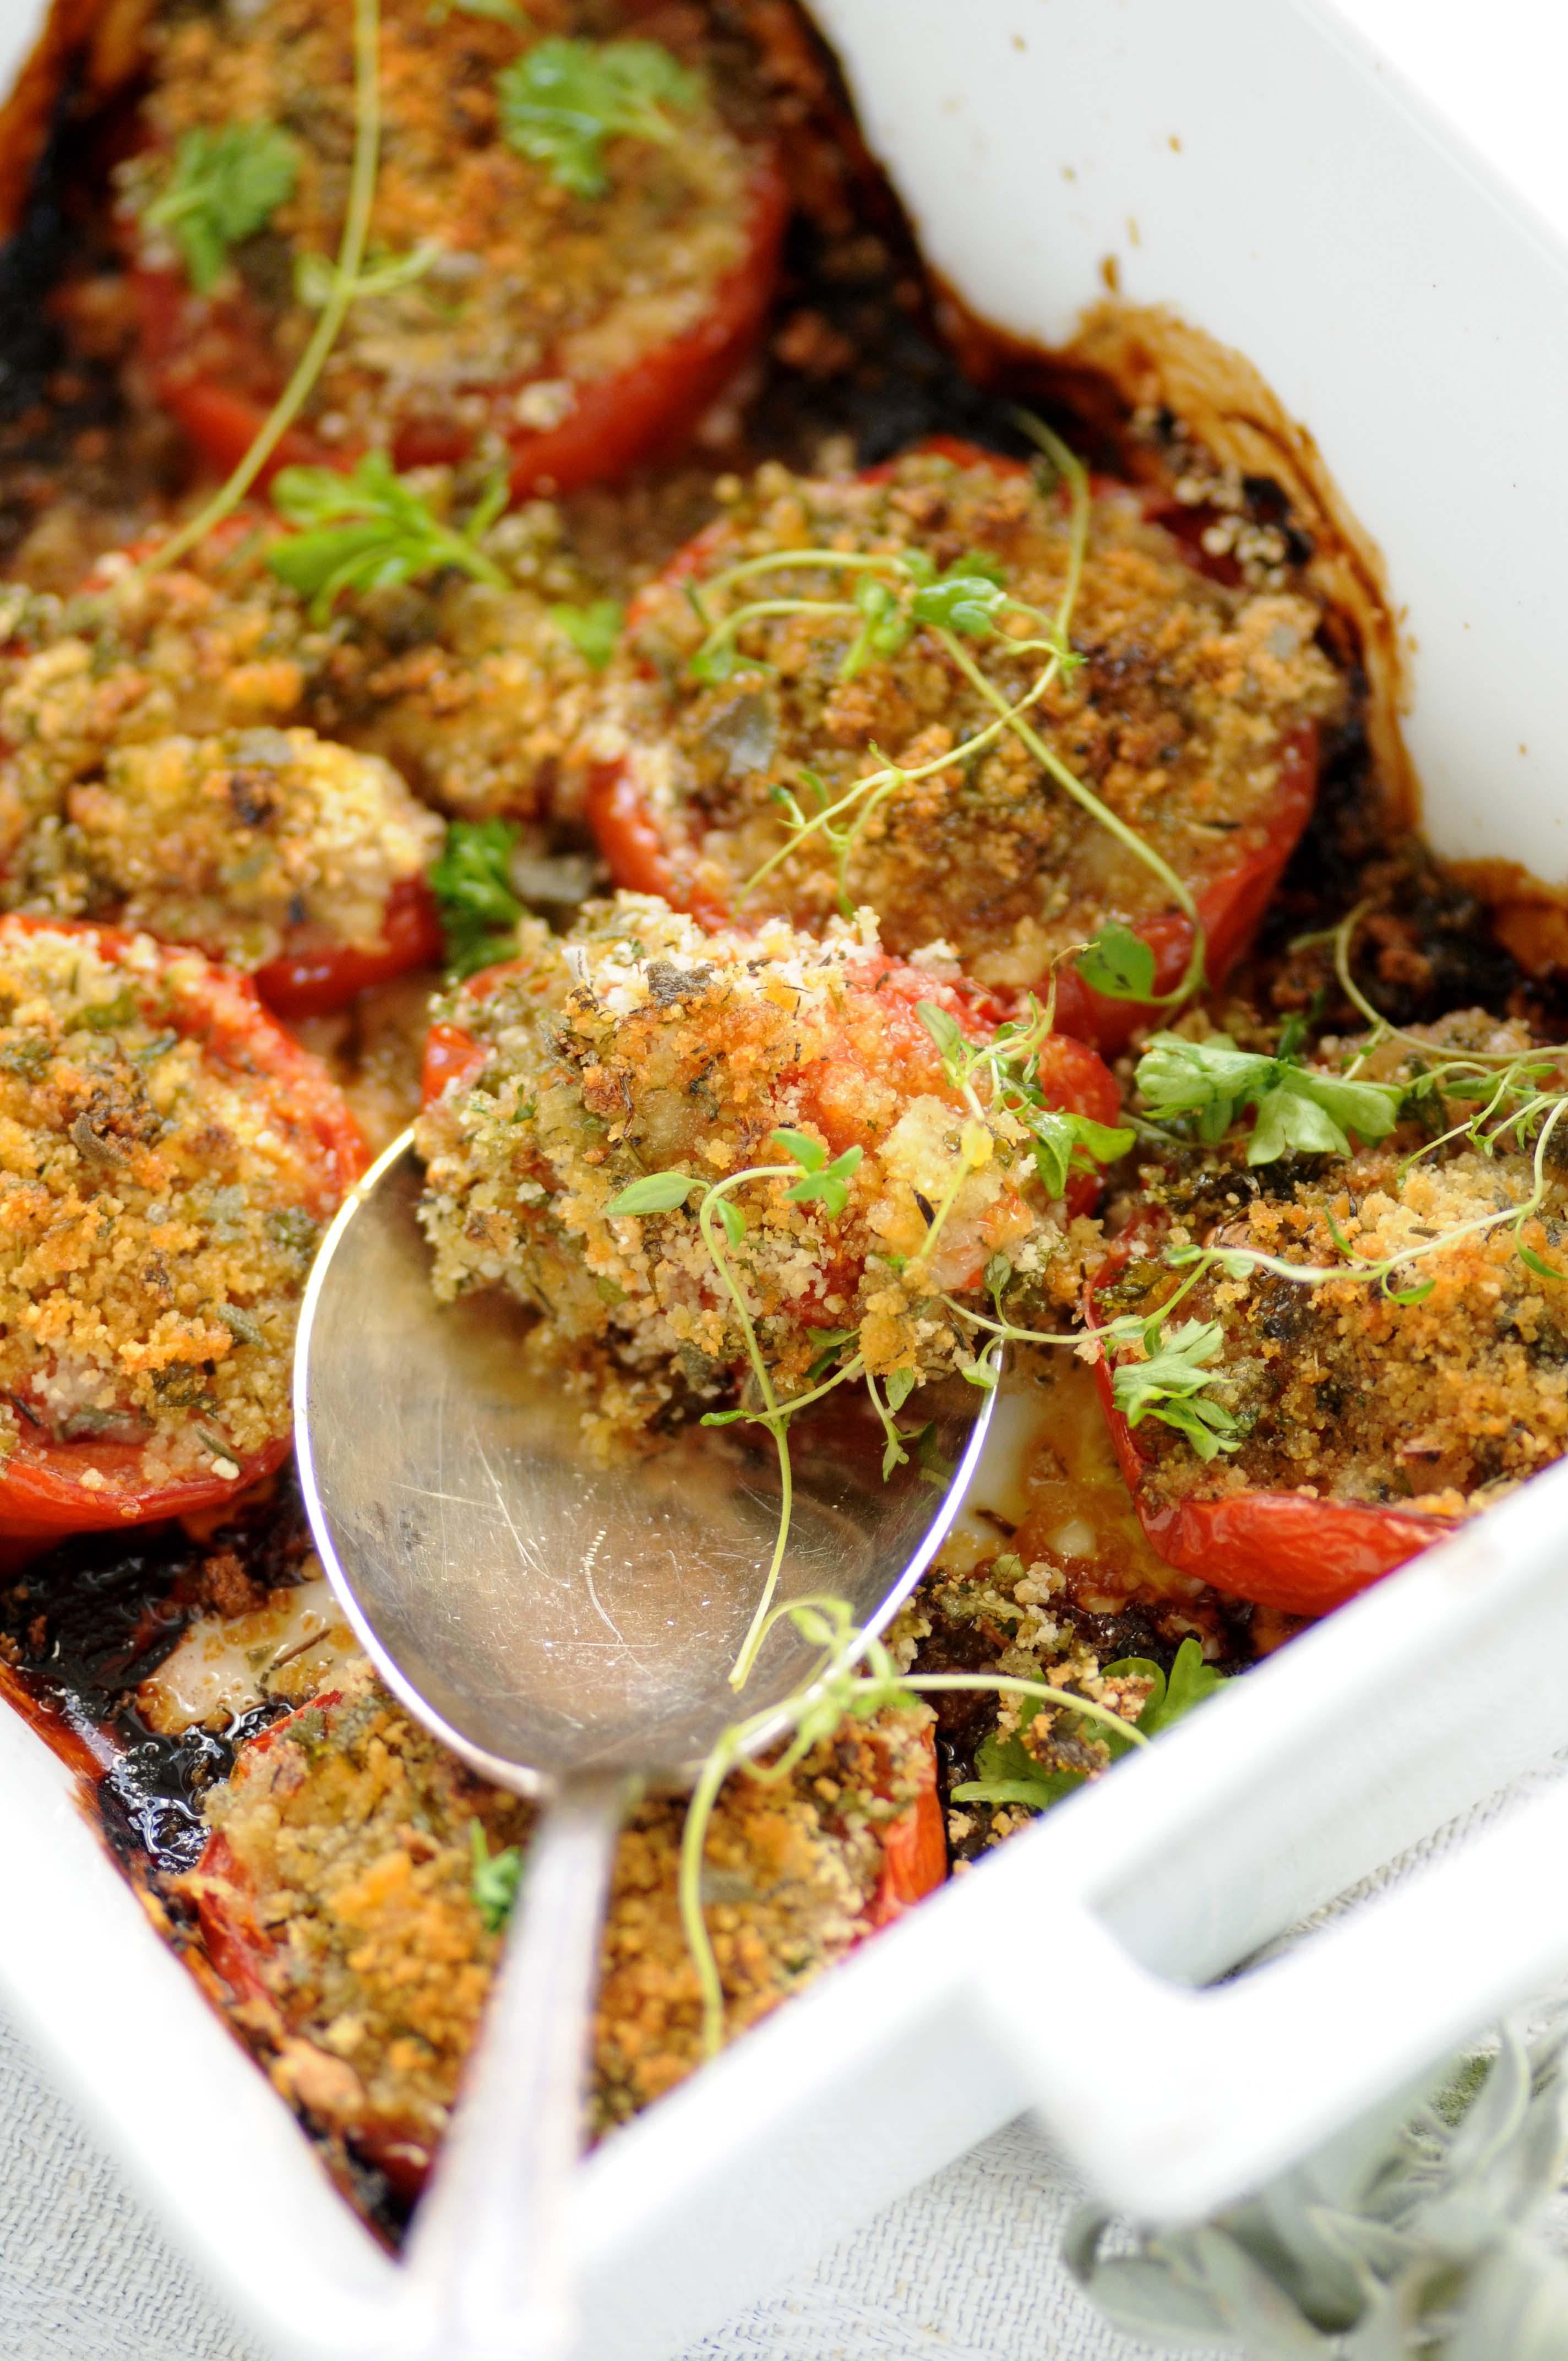 tomater fra Provence – kirstenskaarup.dk